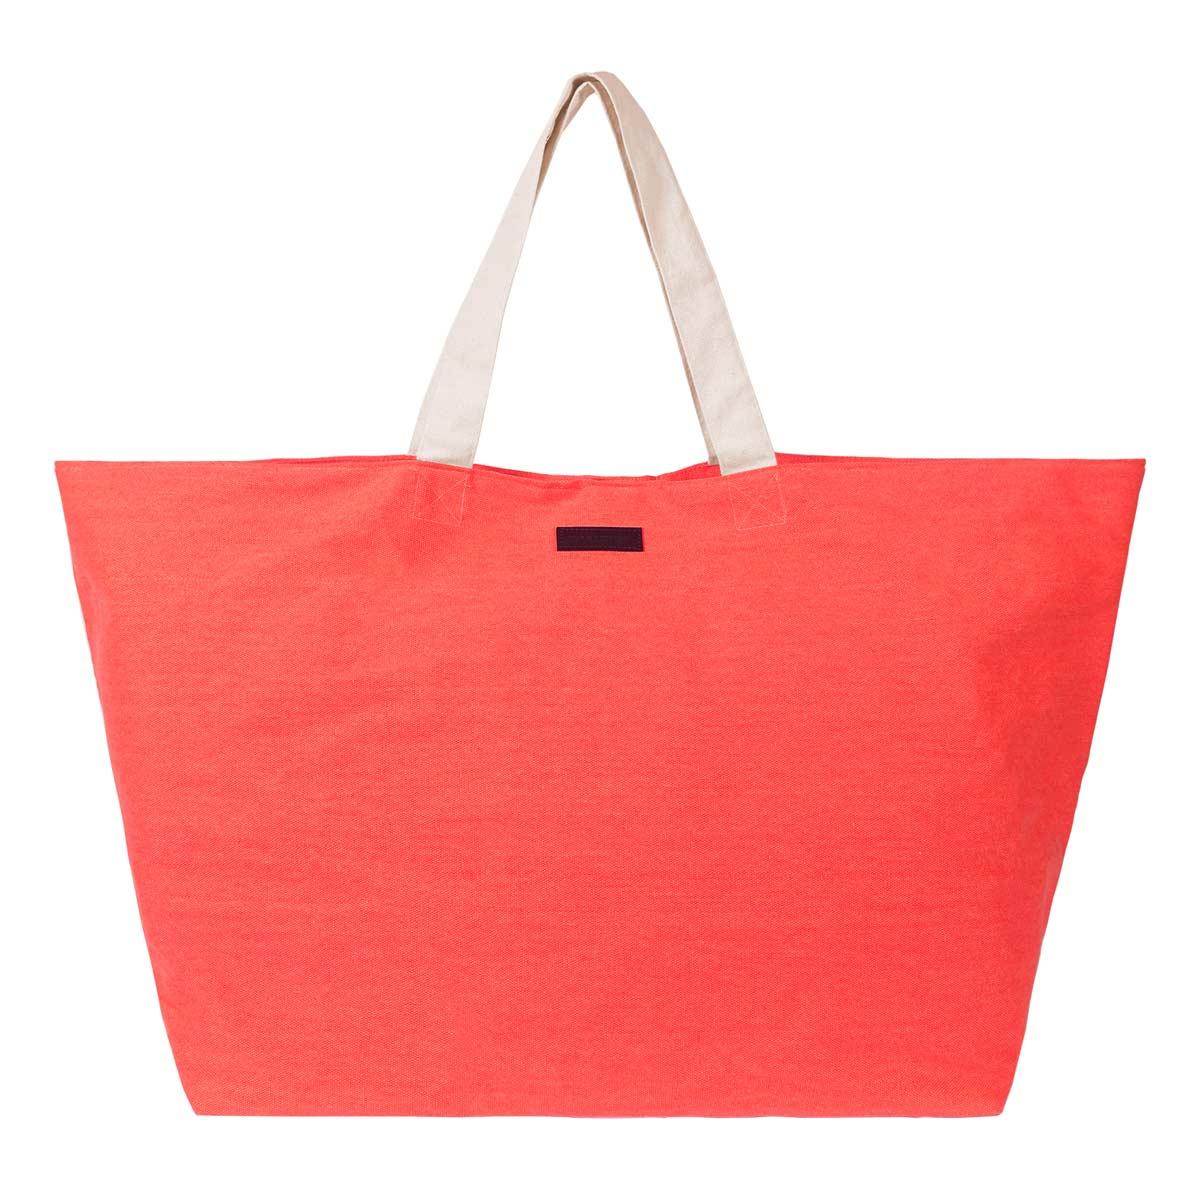 MQ-00191-F12-sac-plage-femme-rouge-xxl